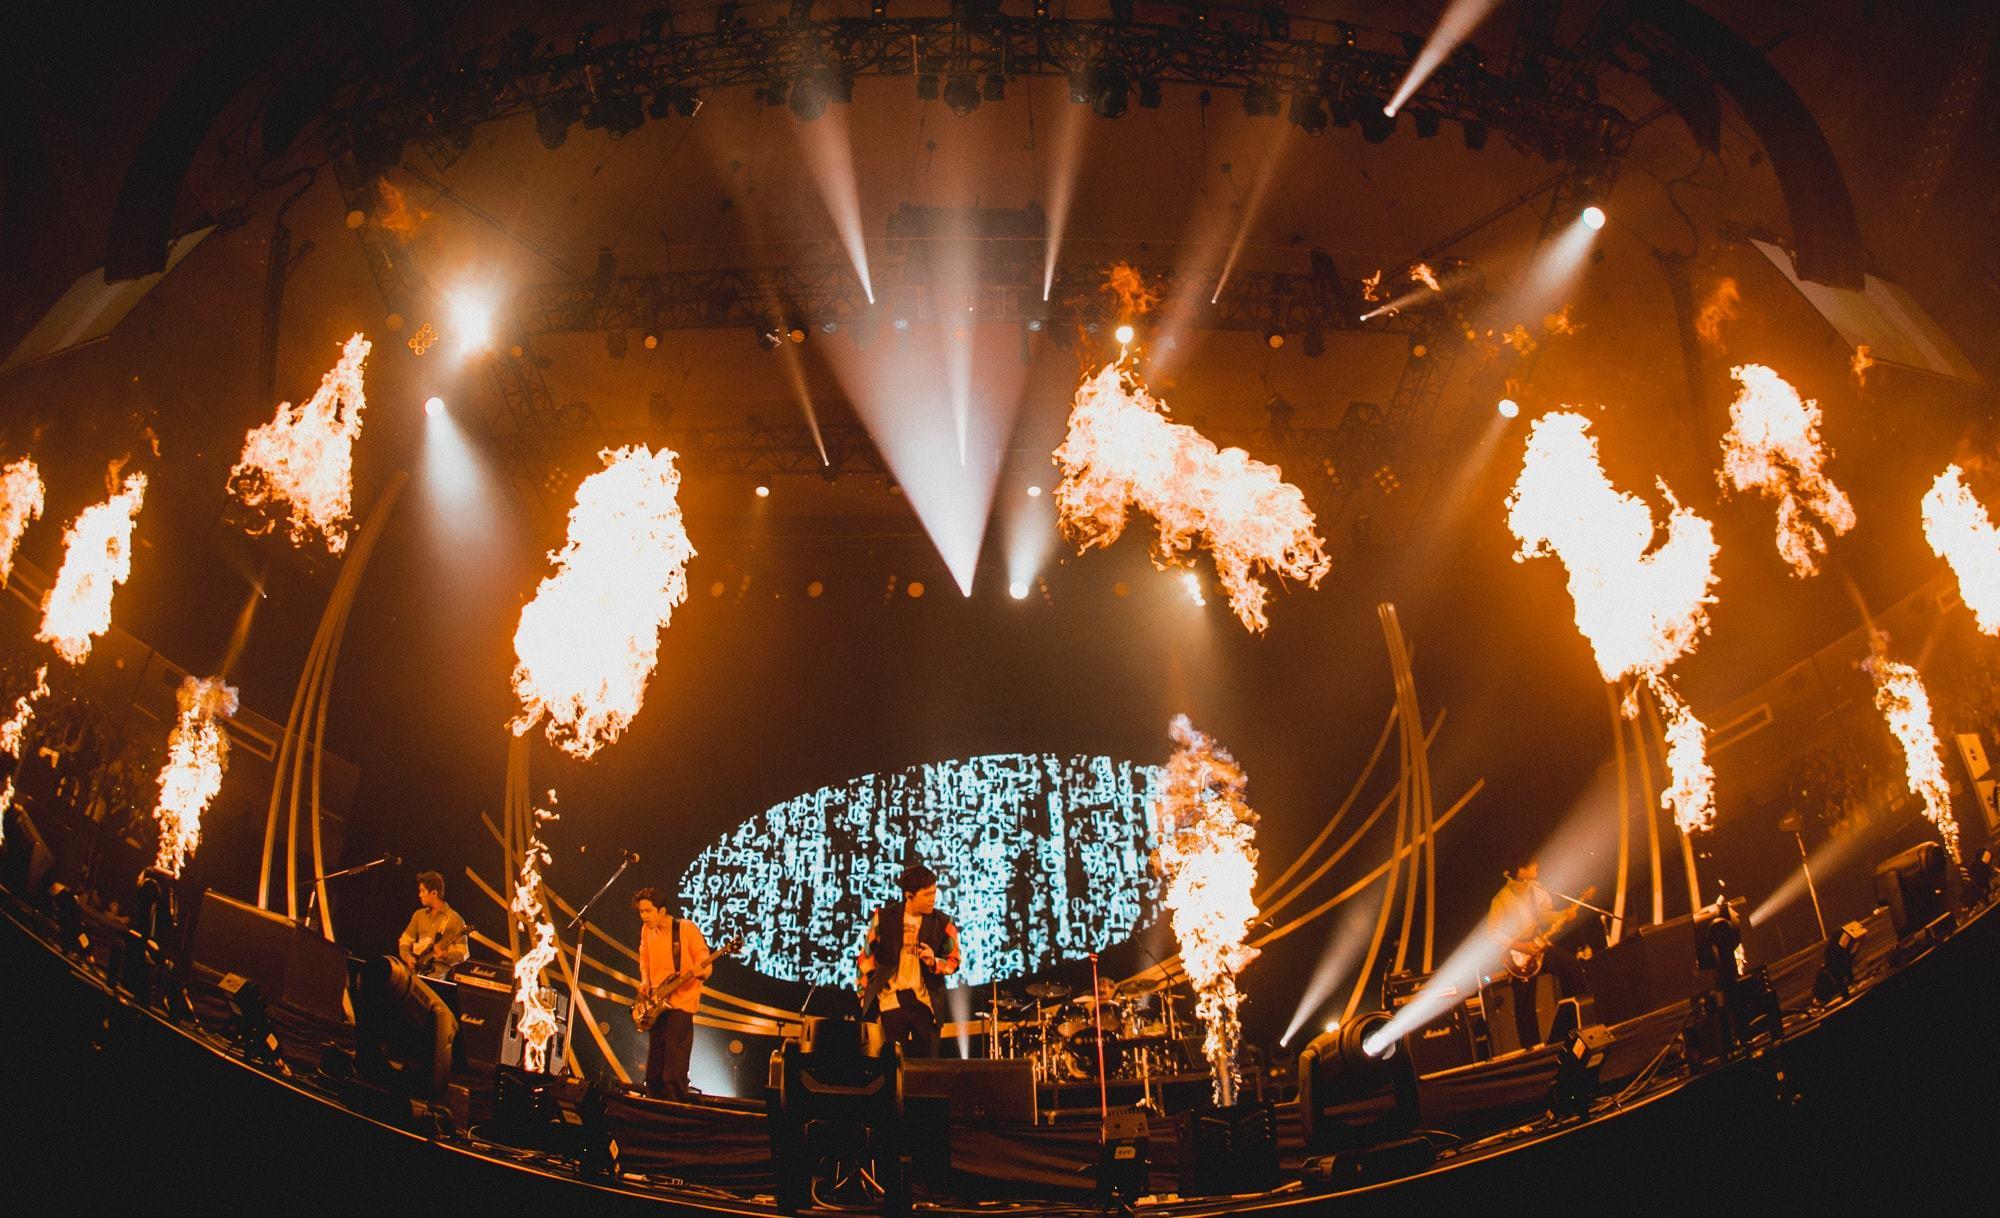 『FTISLAND AUTUMN TOUR 2017 -Here is Paradise-』ファイナル公演